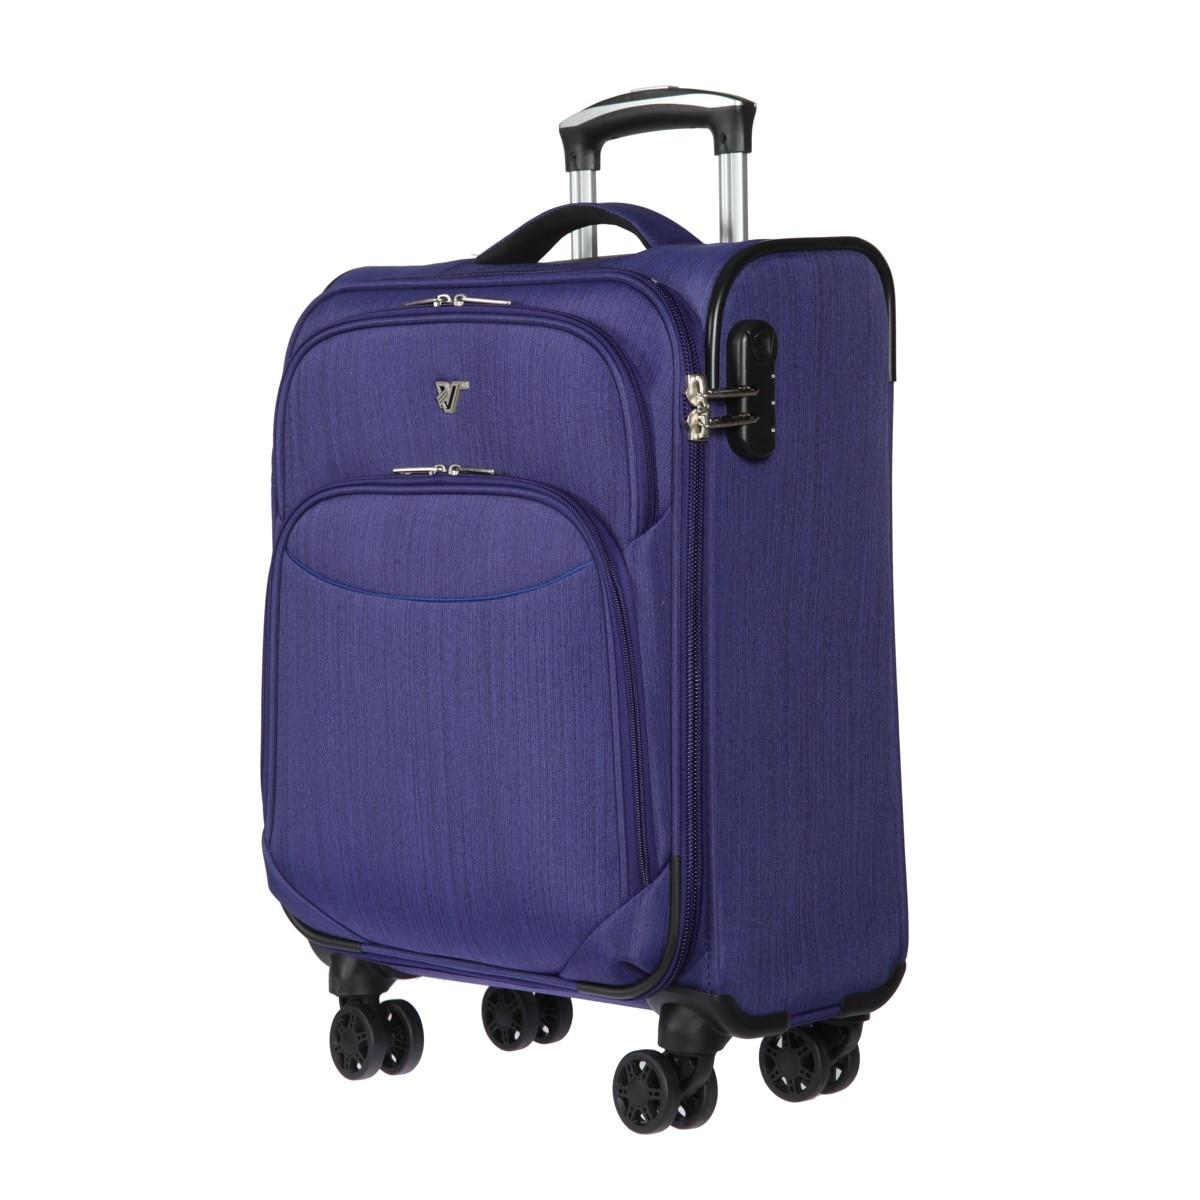 Suitcase-trolley Verage GM17026W18, 5 purple